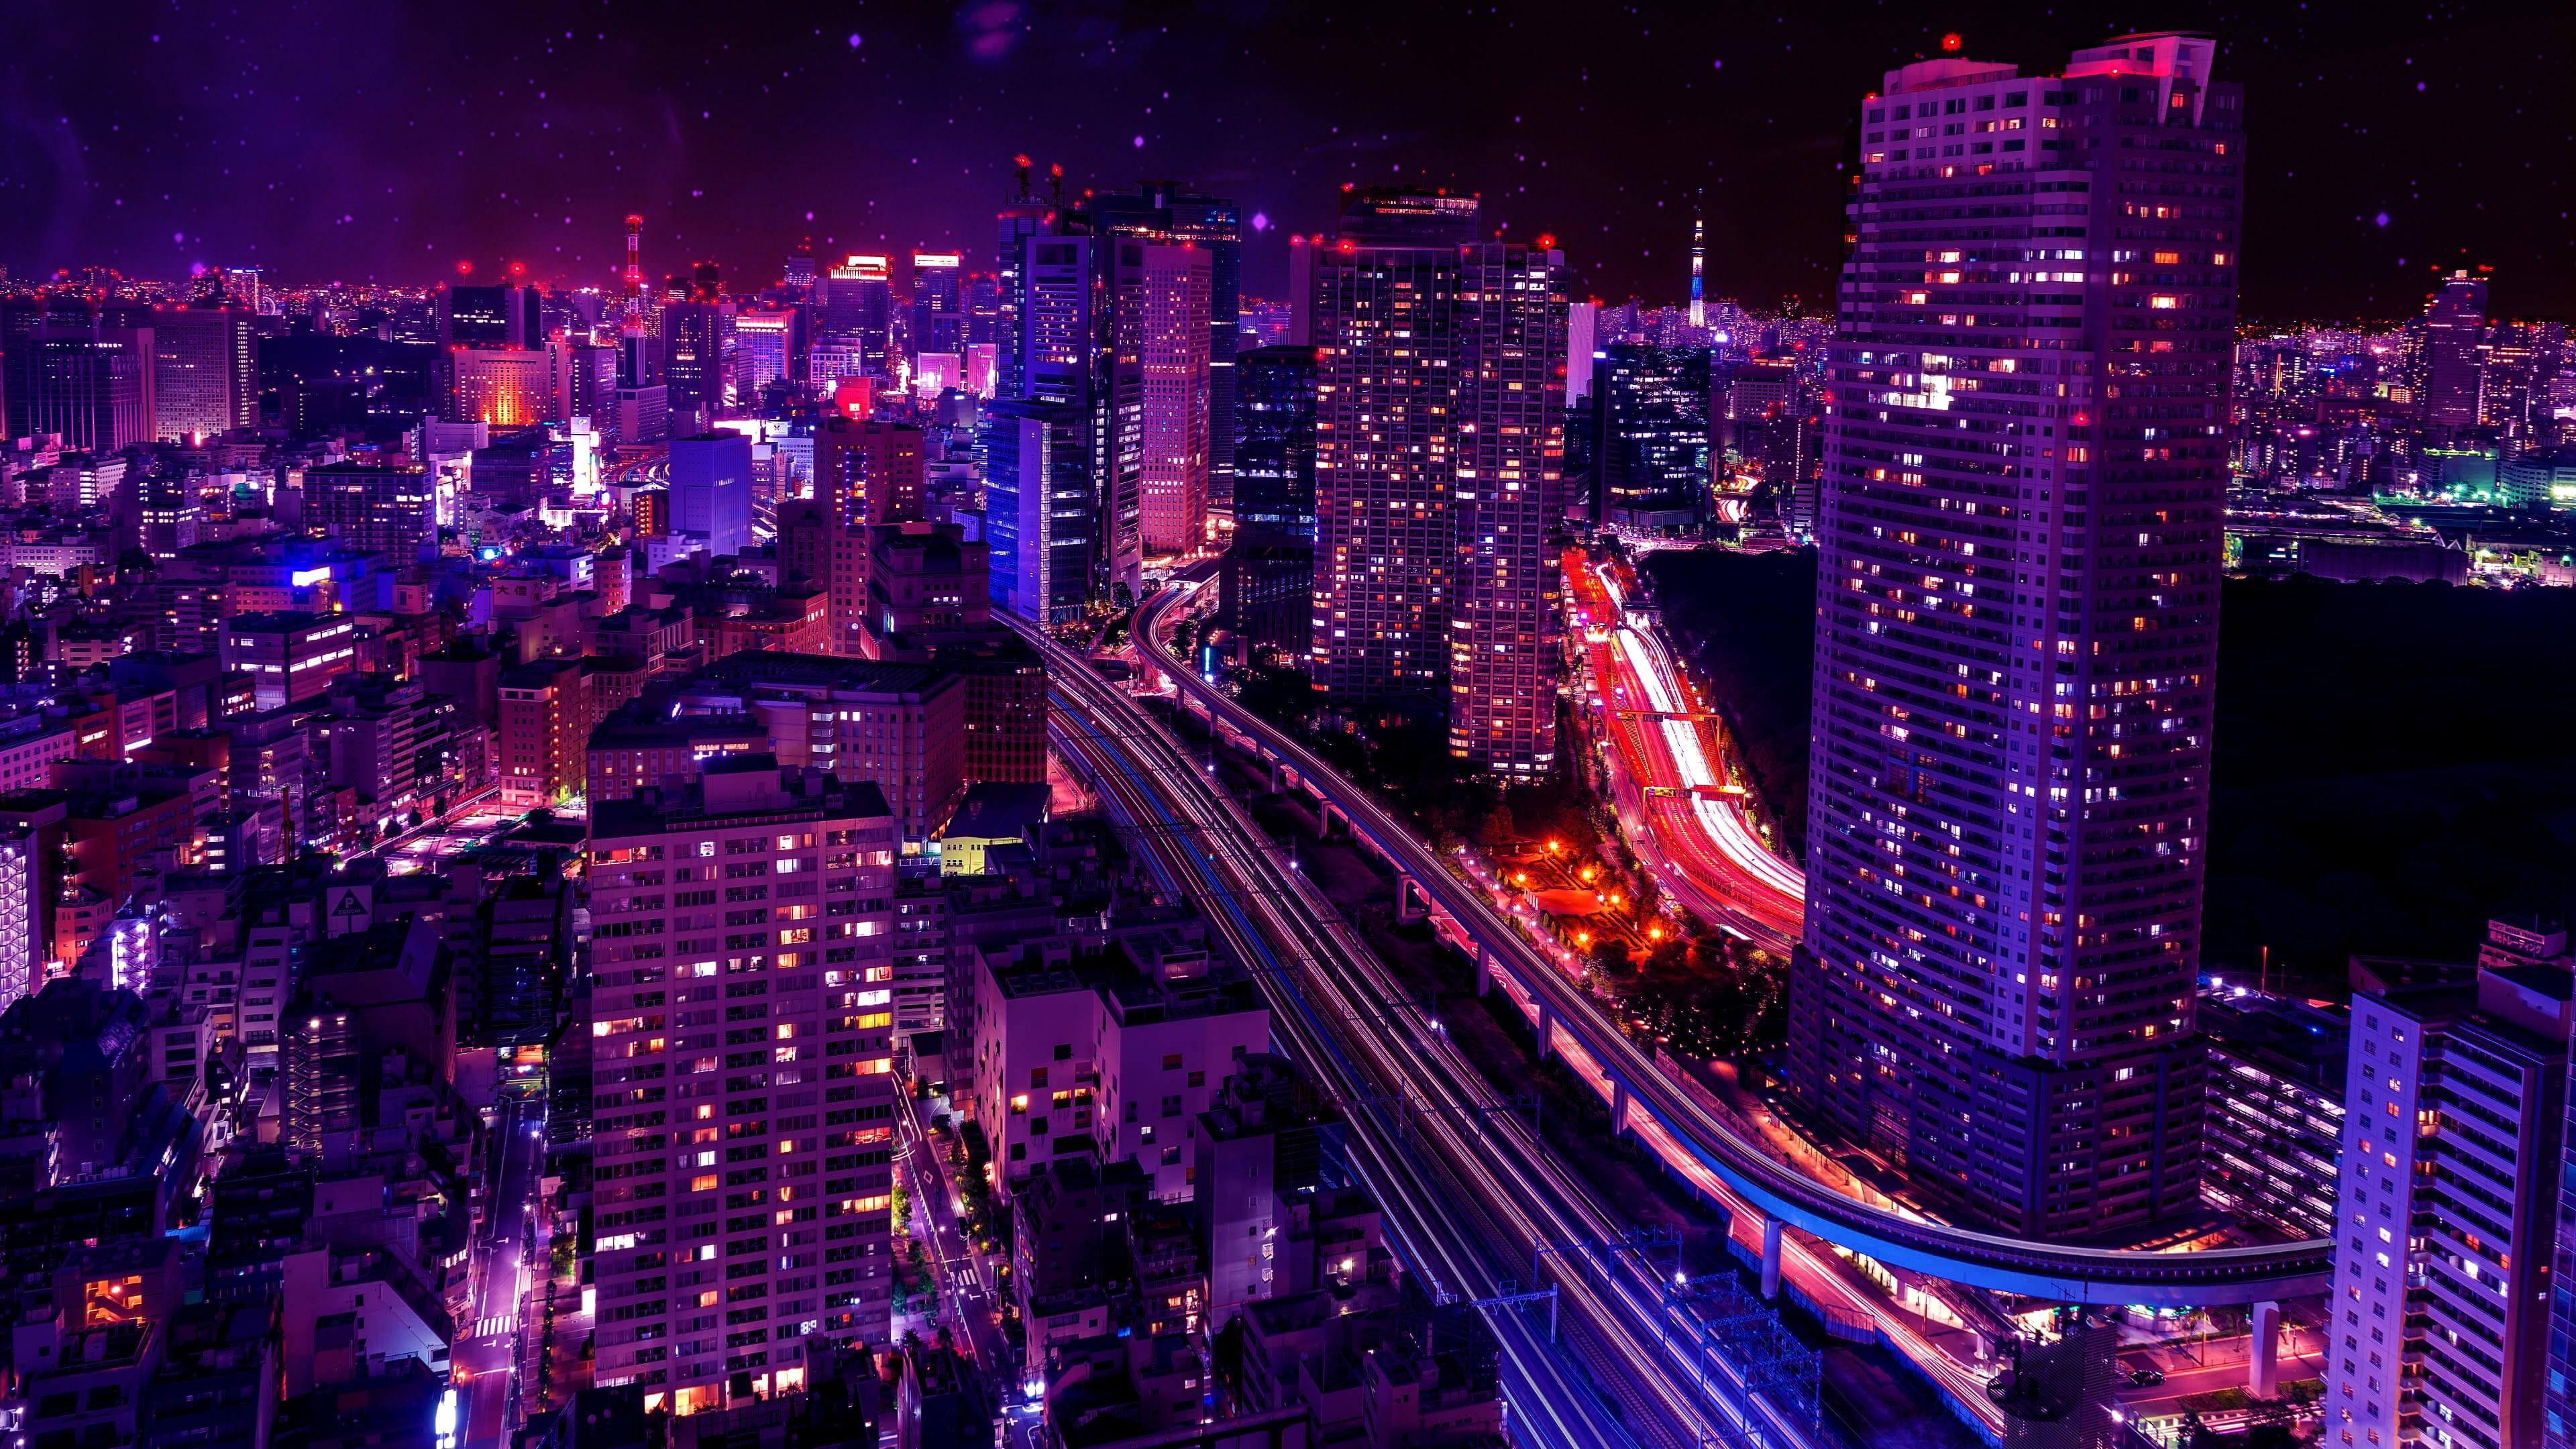 Night In The City 4k Ultra Fondo De Pantalla Hd Fondo De